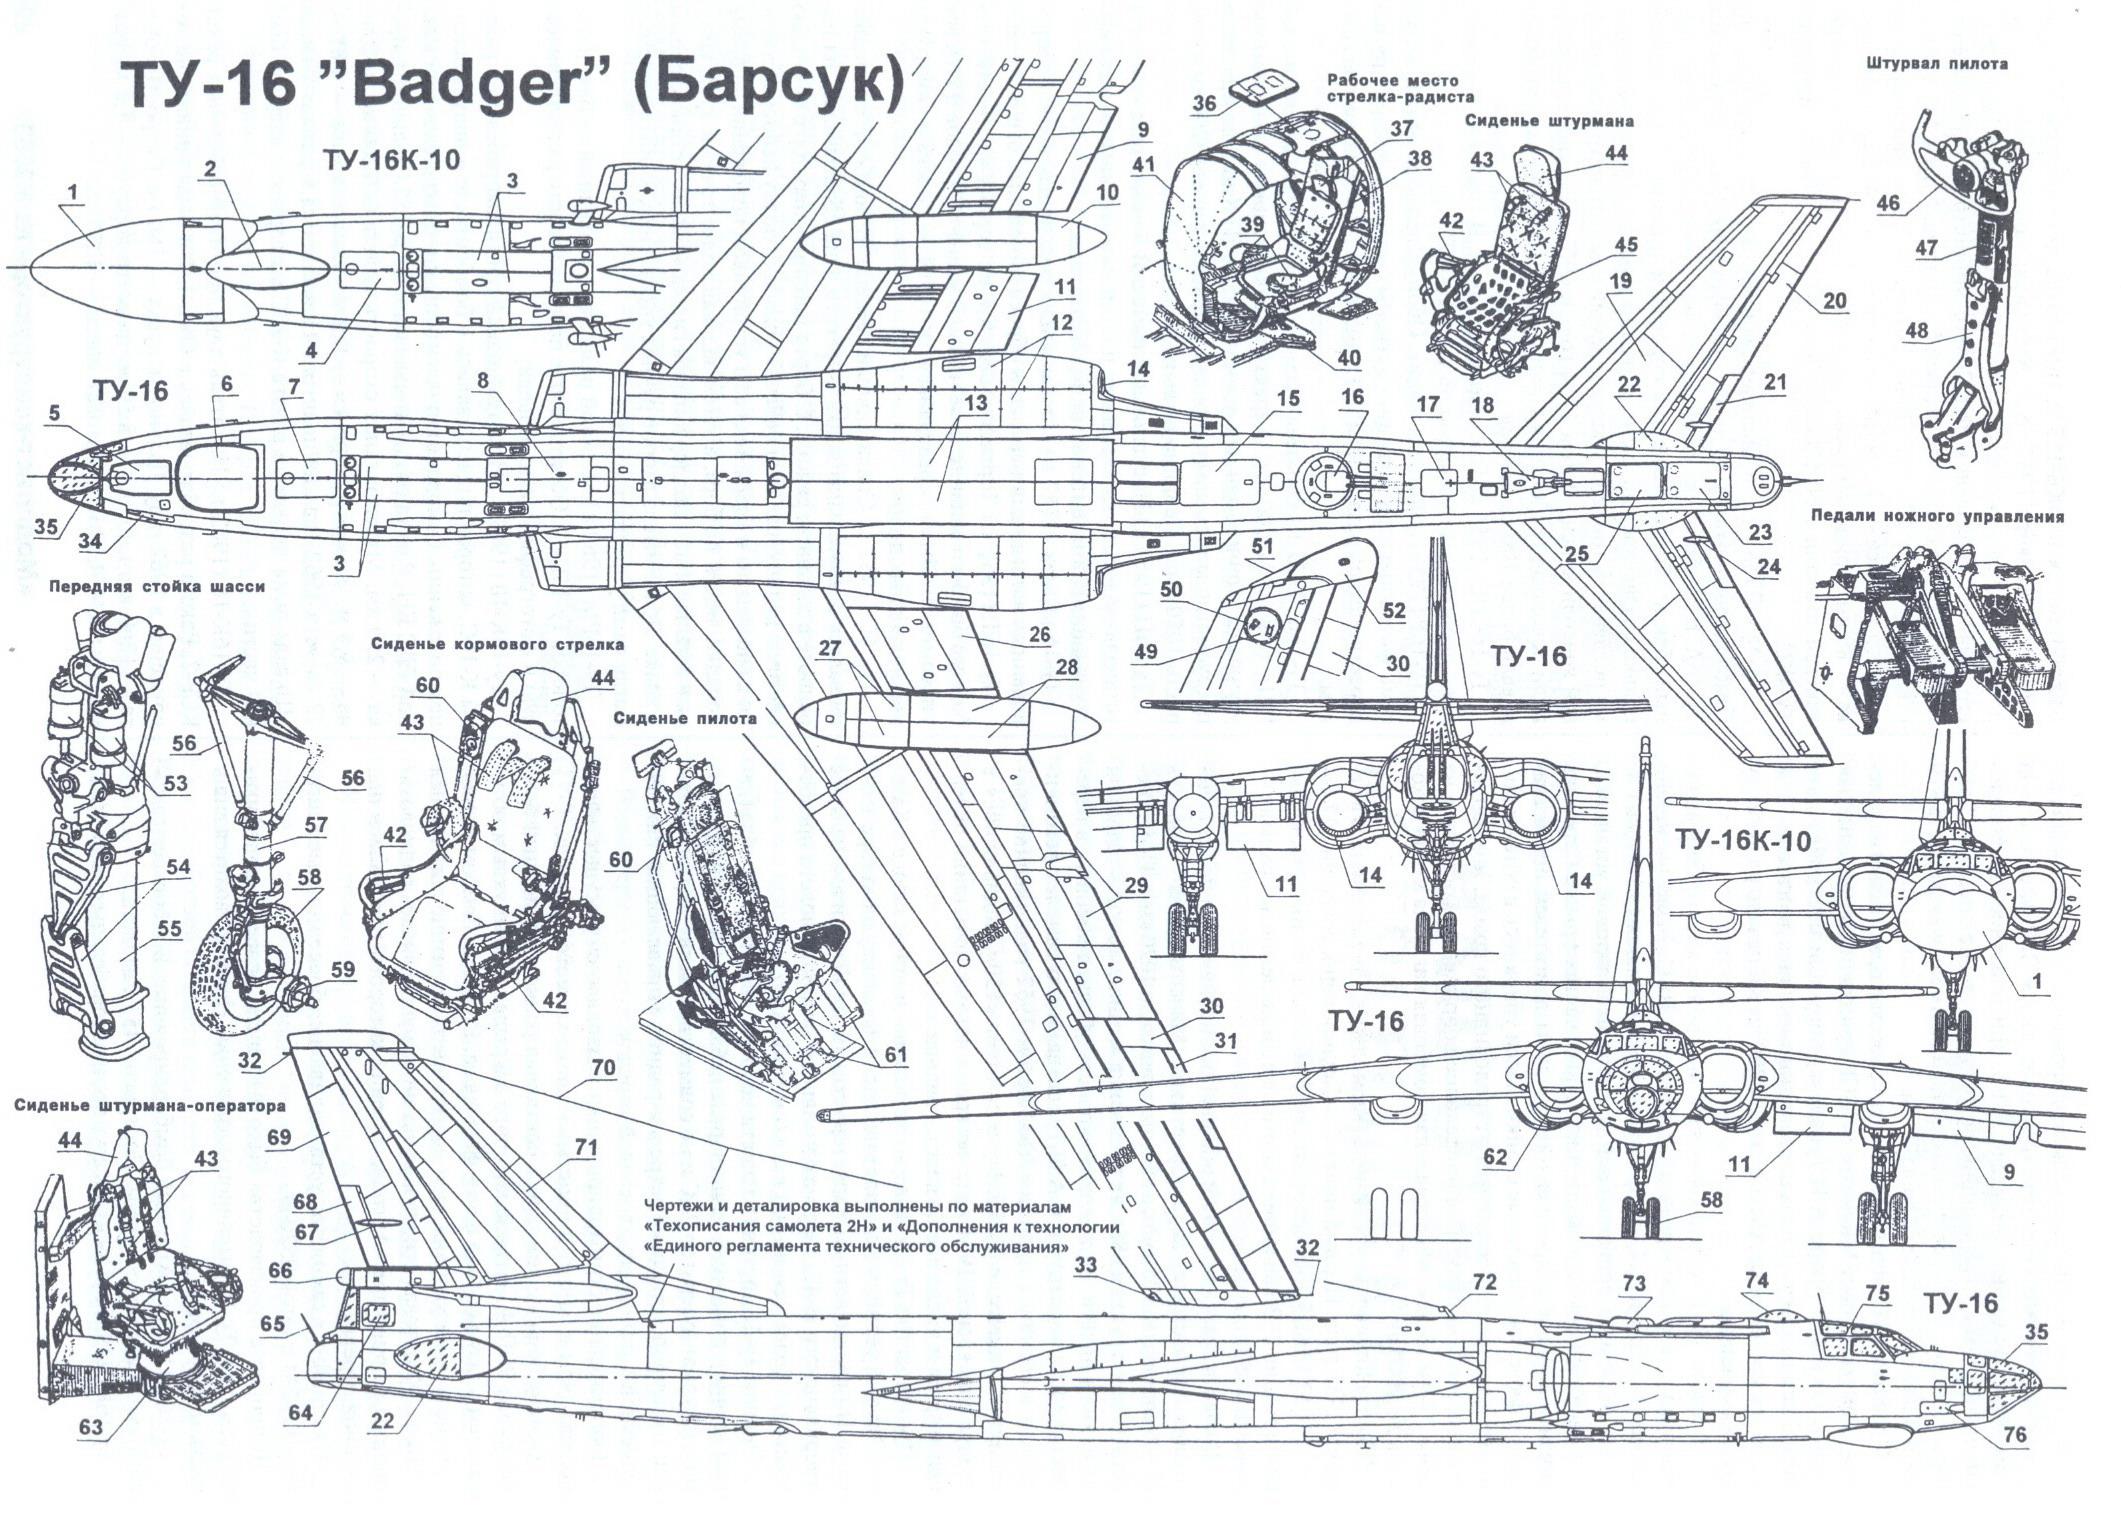 Tu-16 blueprint